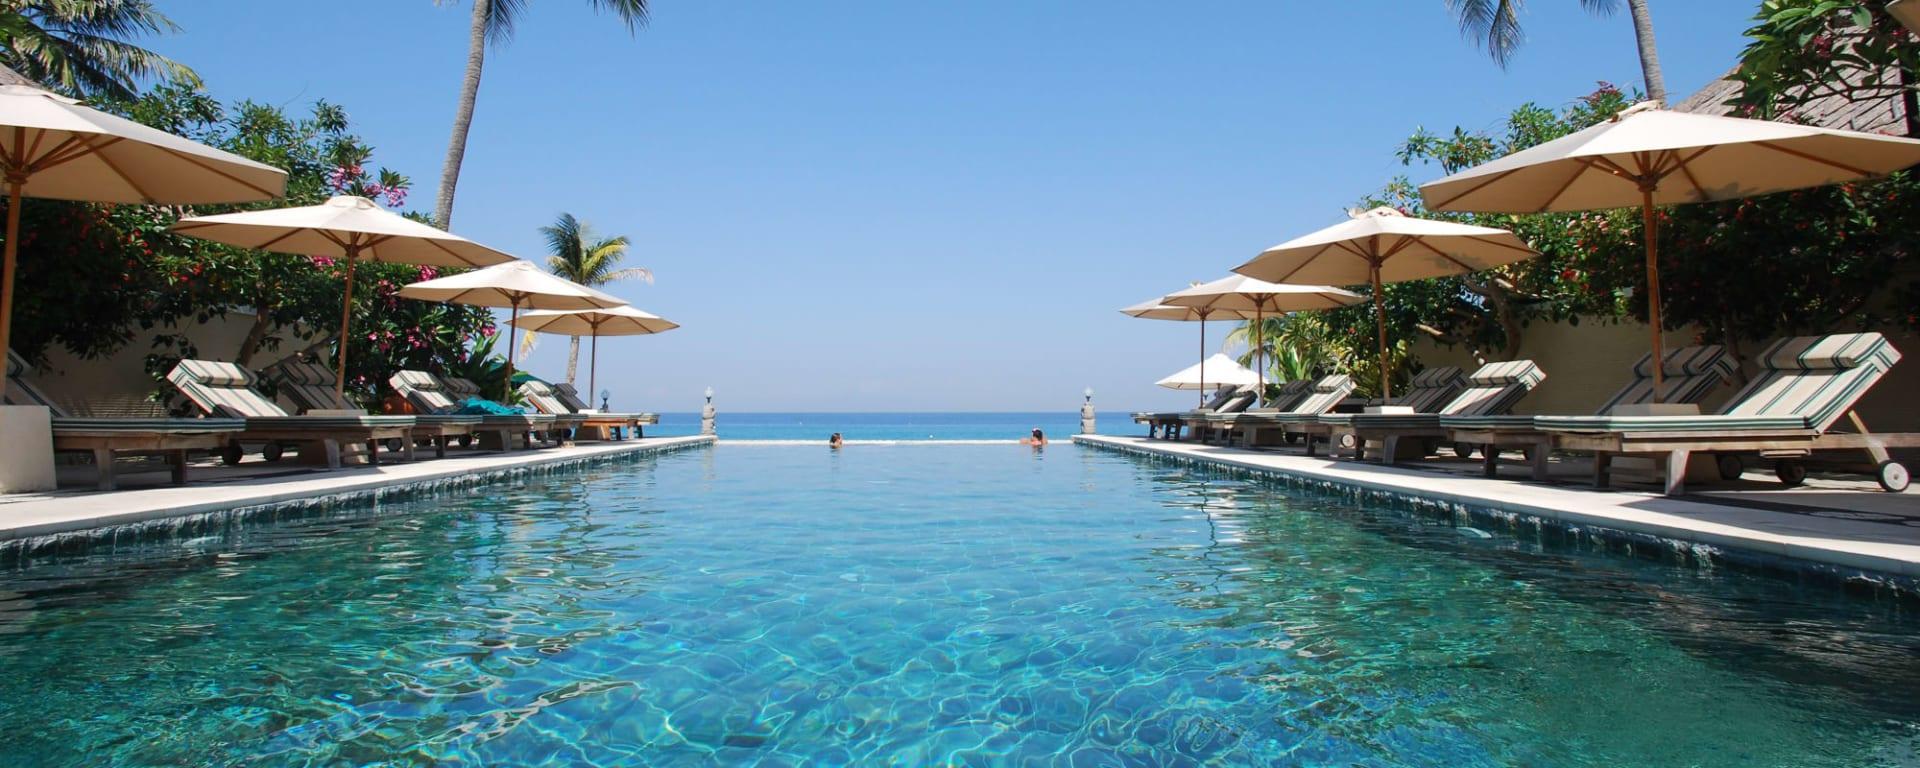 Puri Mas Beach Resort in Lombok: Lombok Puri Mas Reach Resort